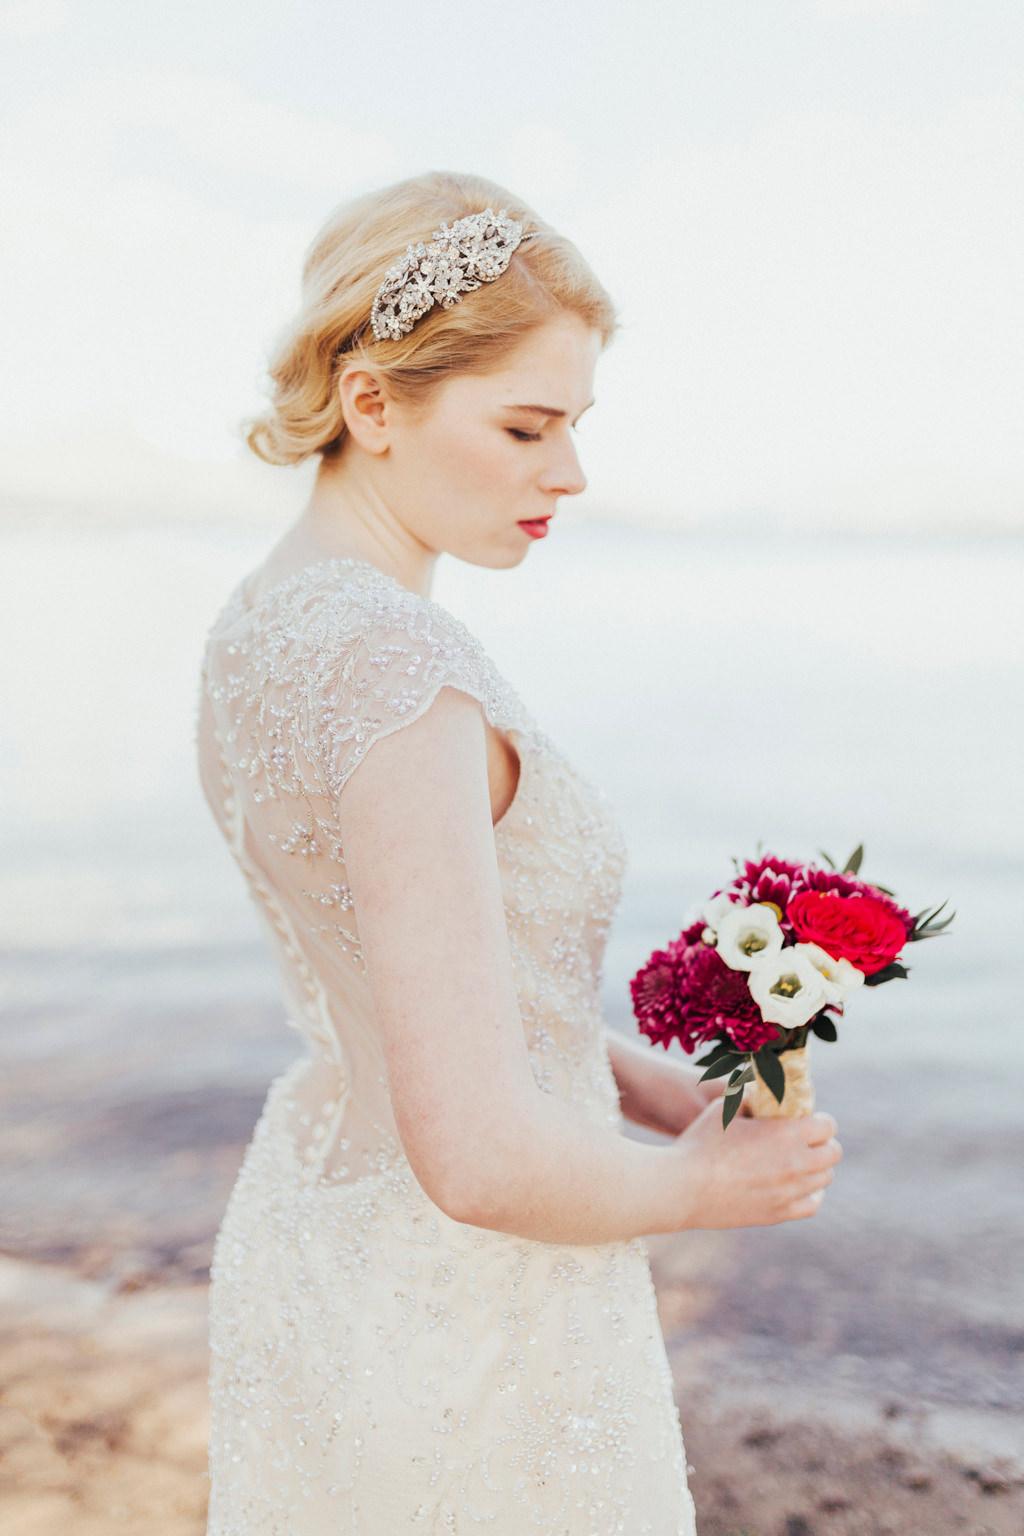 006-vintage-lace-embellished-wedding-dress-photographer.jpg